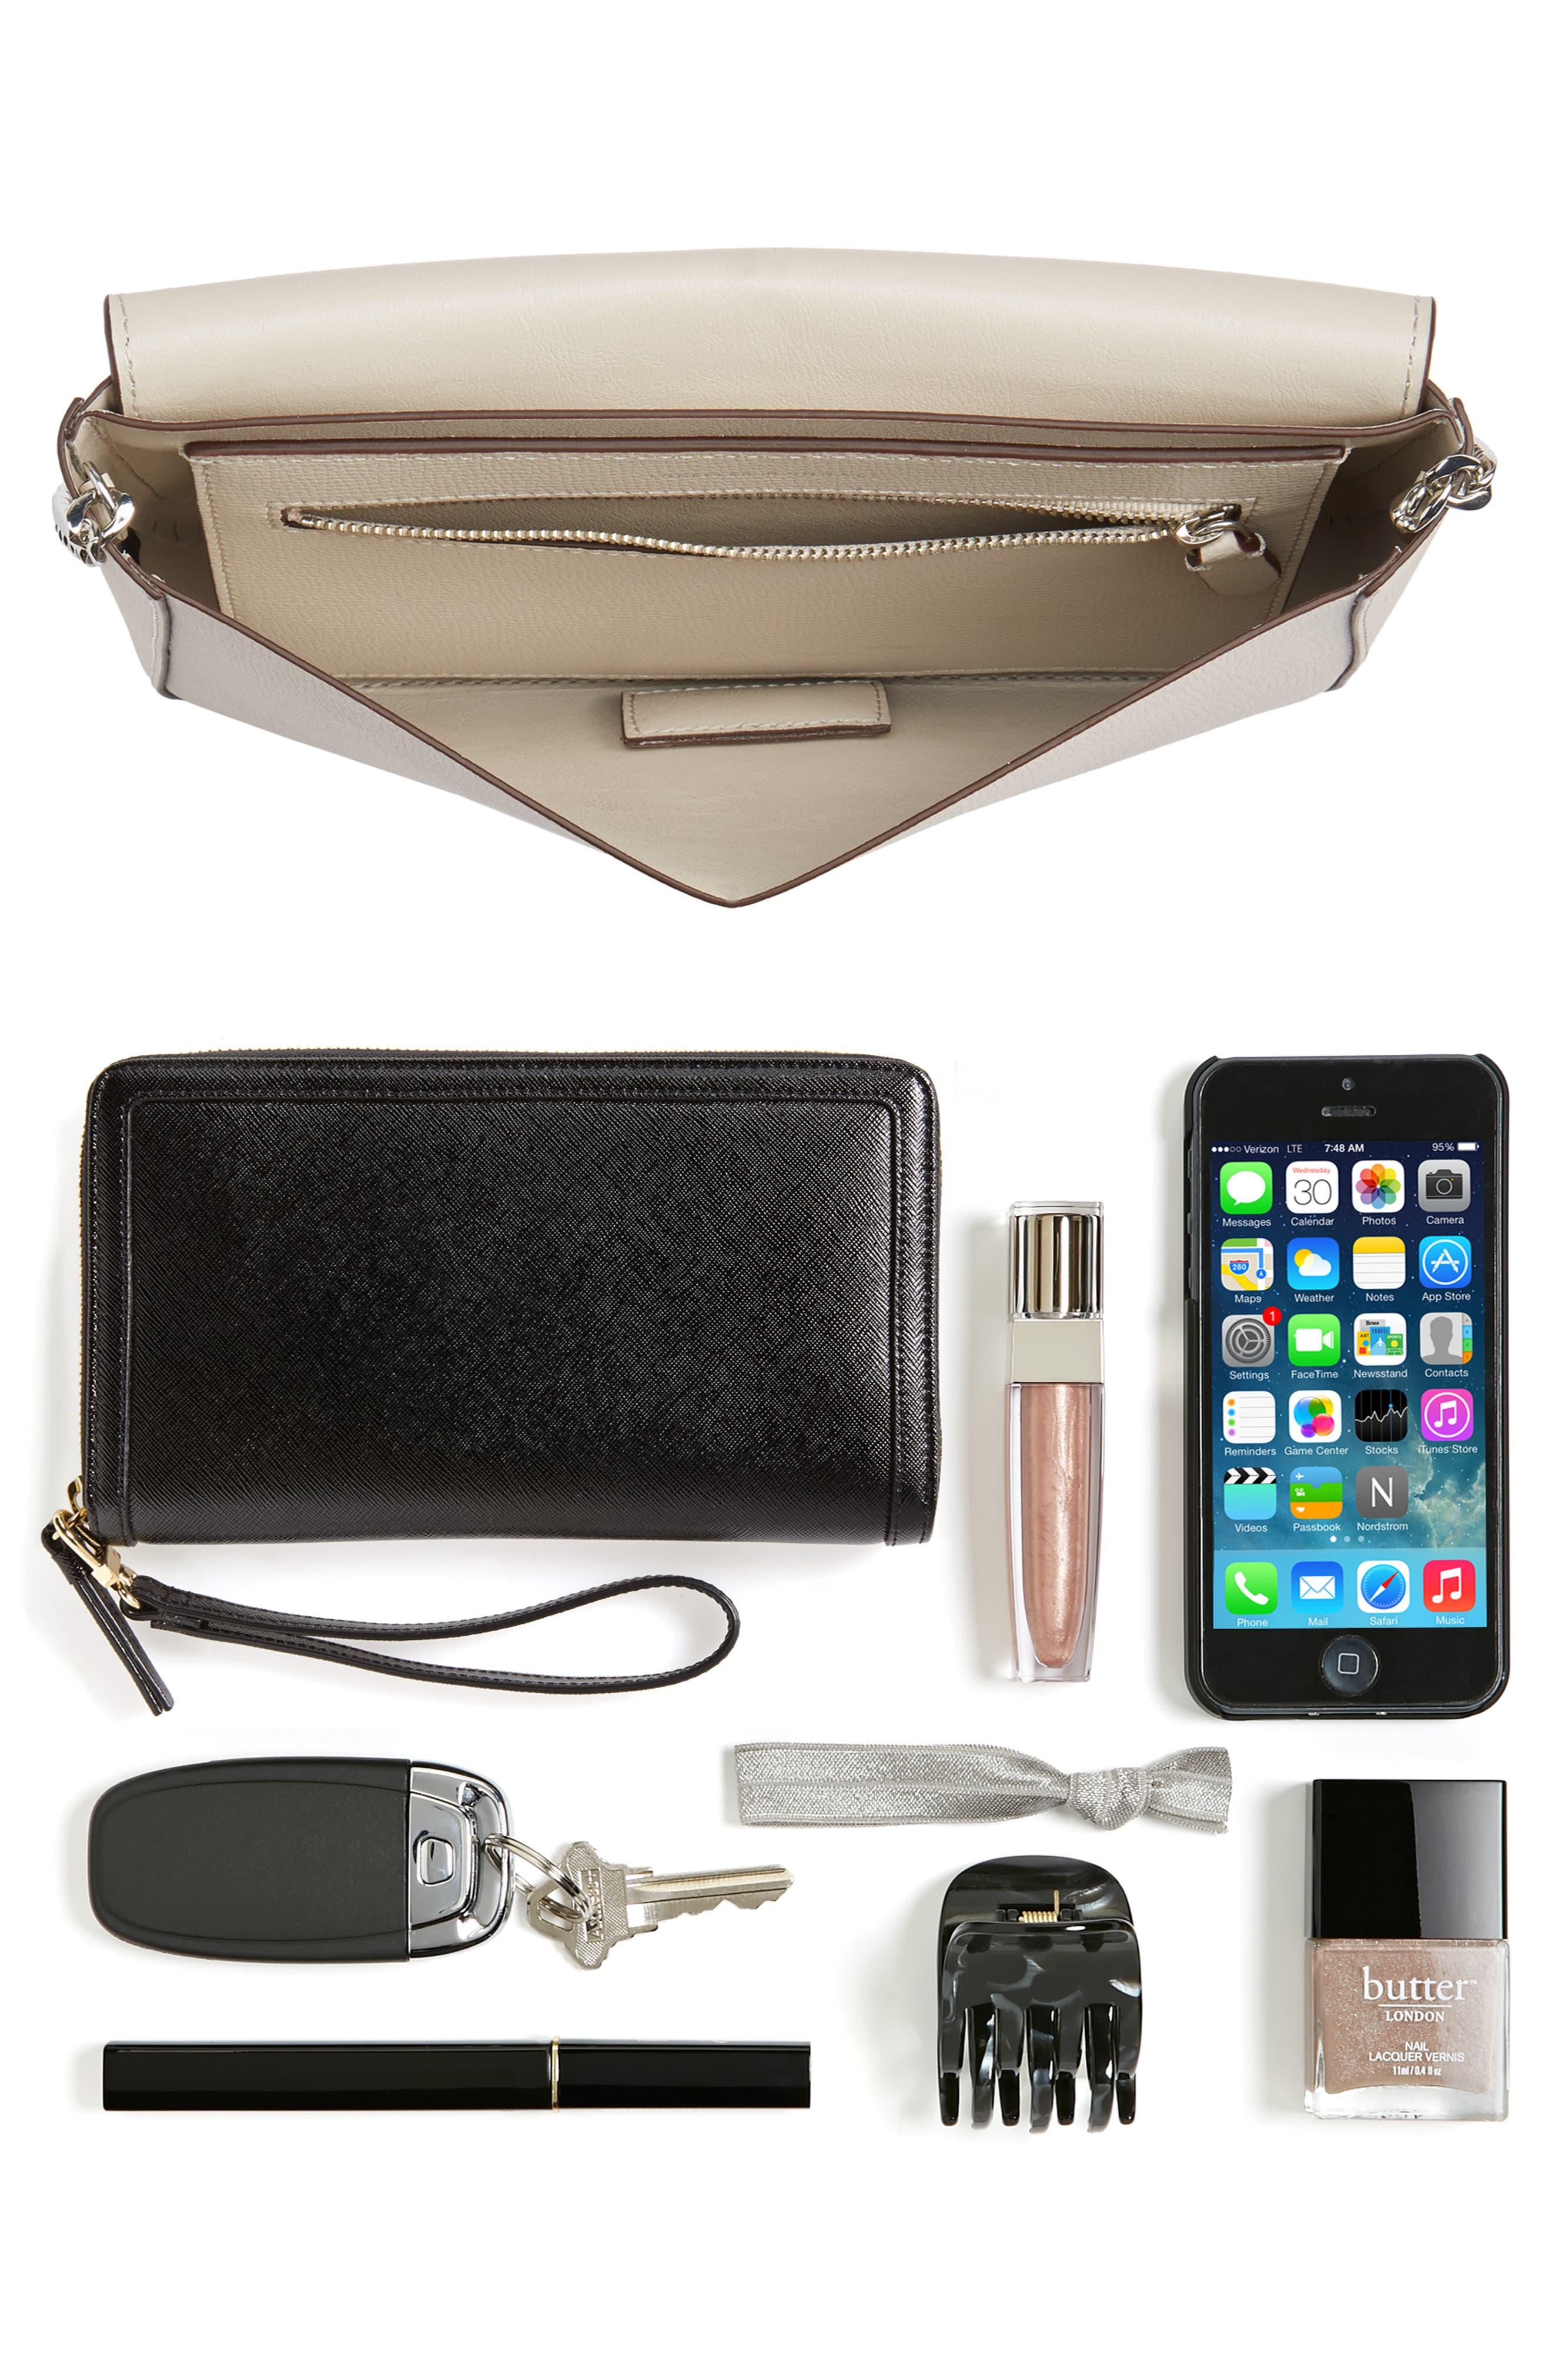 Lock Leather Flap Clutch/Shoulder Bag,                             Alternate thumbnail 7, color,                             030